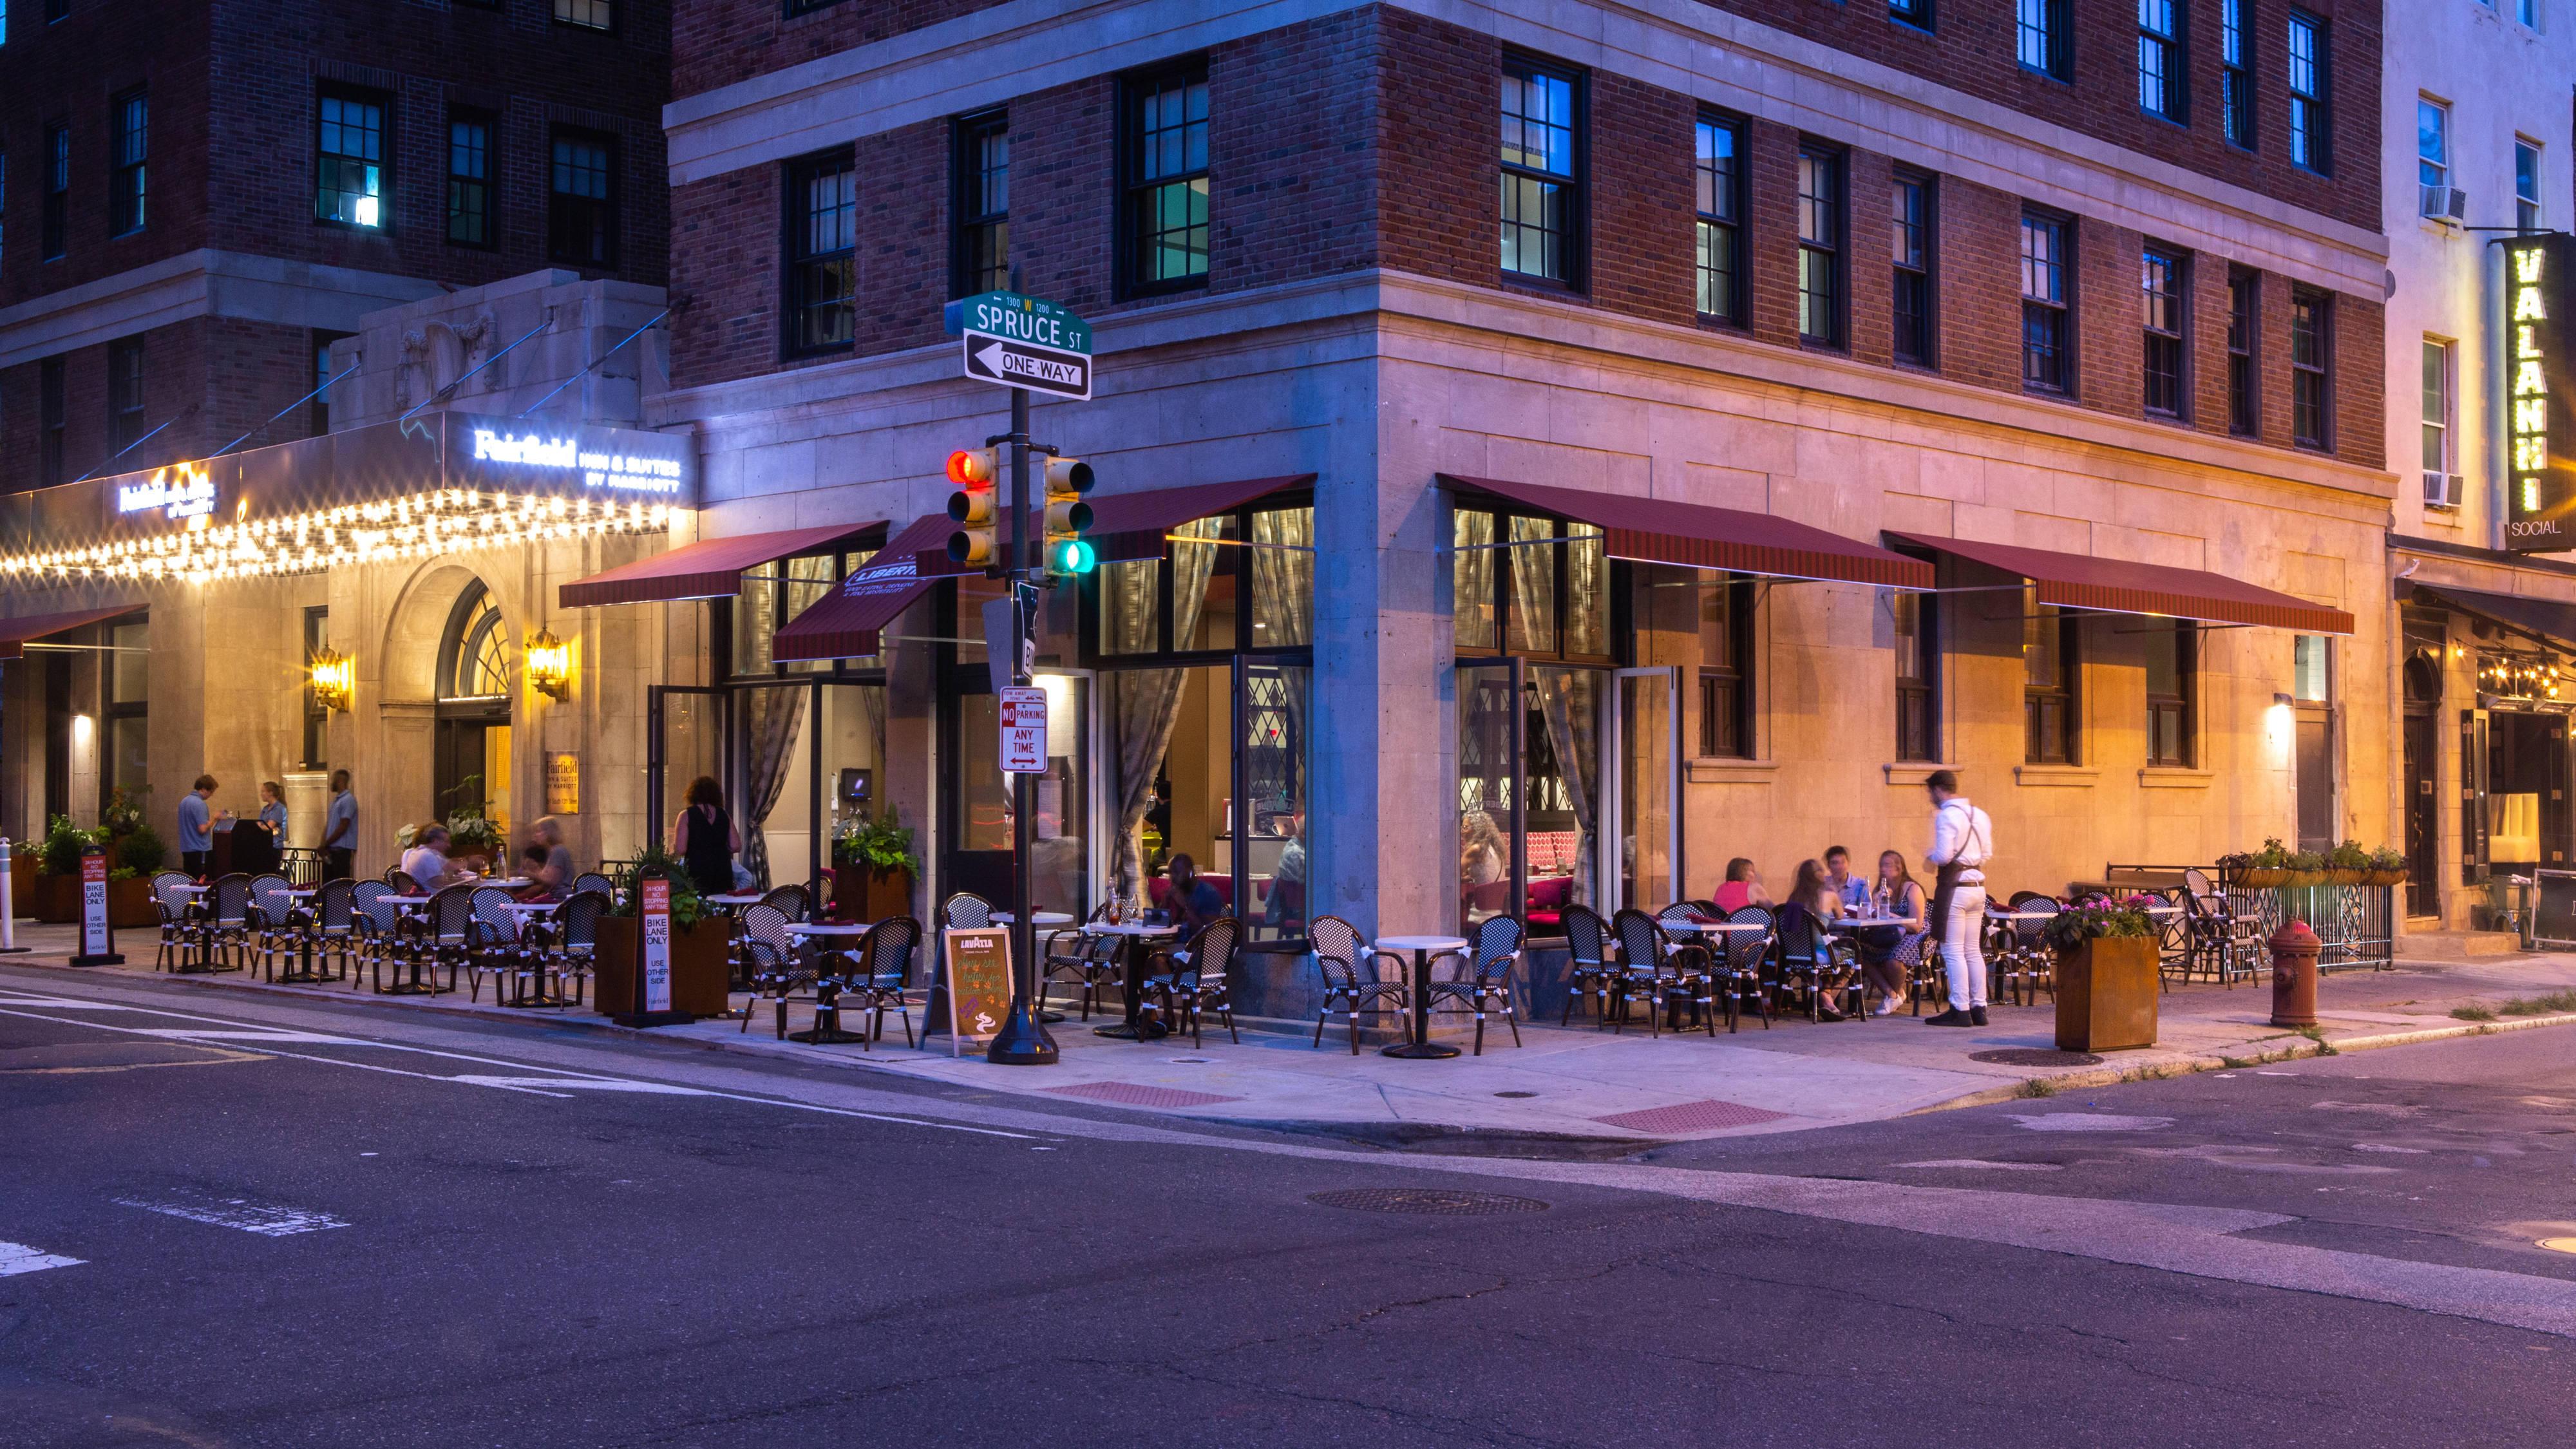 Fairfield Inn & Suites by Marriott Philadelphia Downtown/Center City image 2